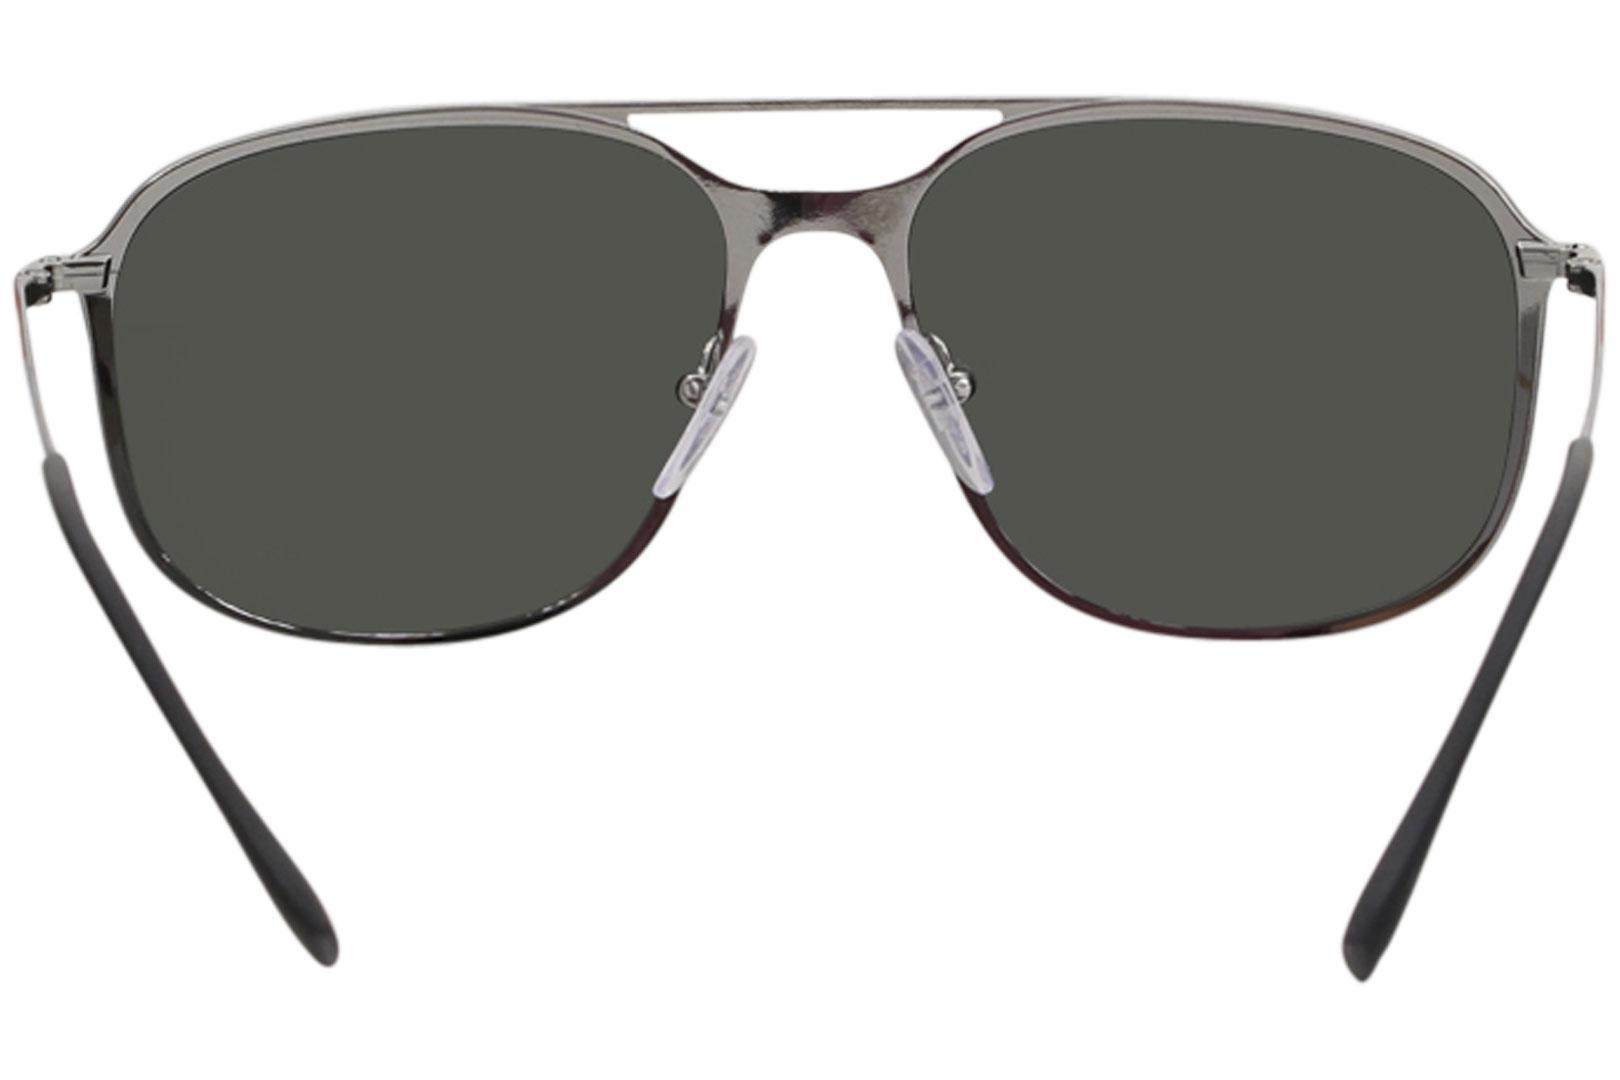 b14c92ad60 Prada Linea Rossa Men s SPS53T SPS 53T Fashion Pilot Sunglasses